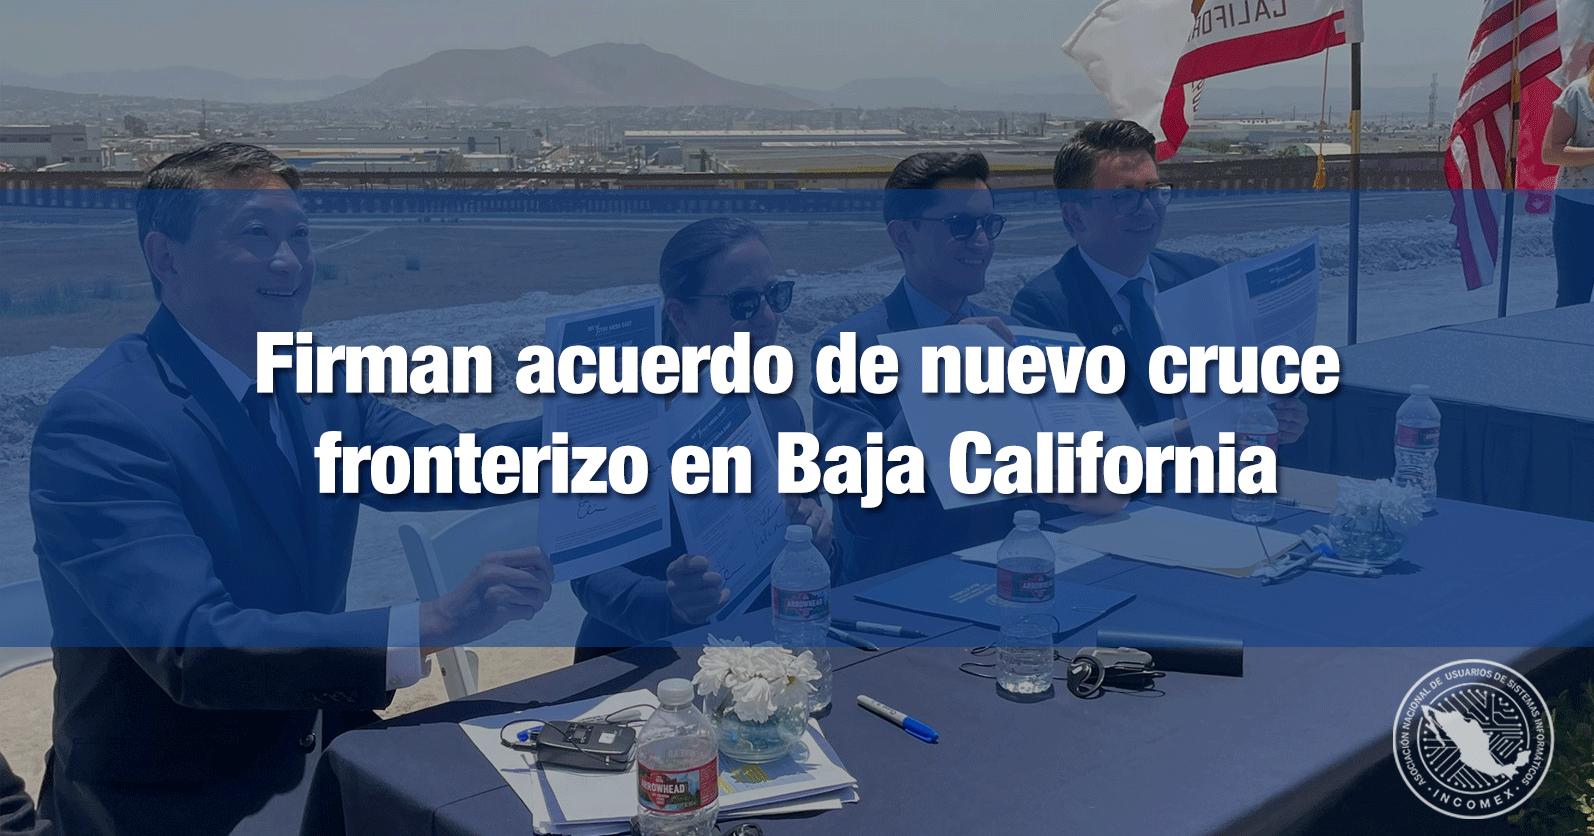 Firman acuerdo de nuevo cruce fronterizo en Baja California